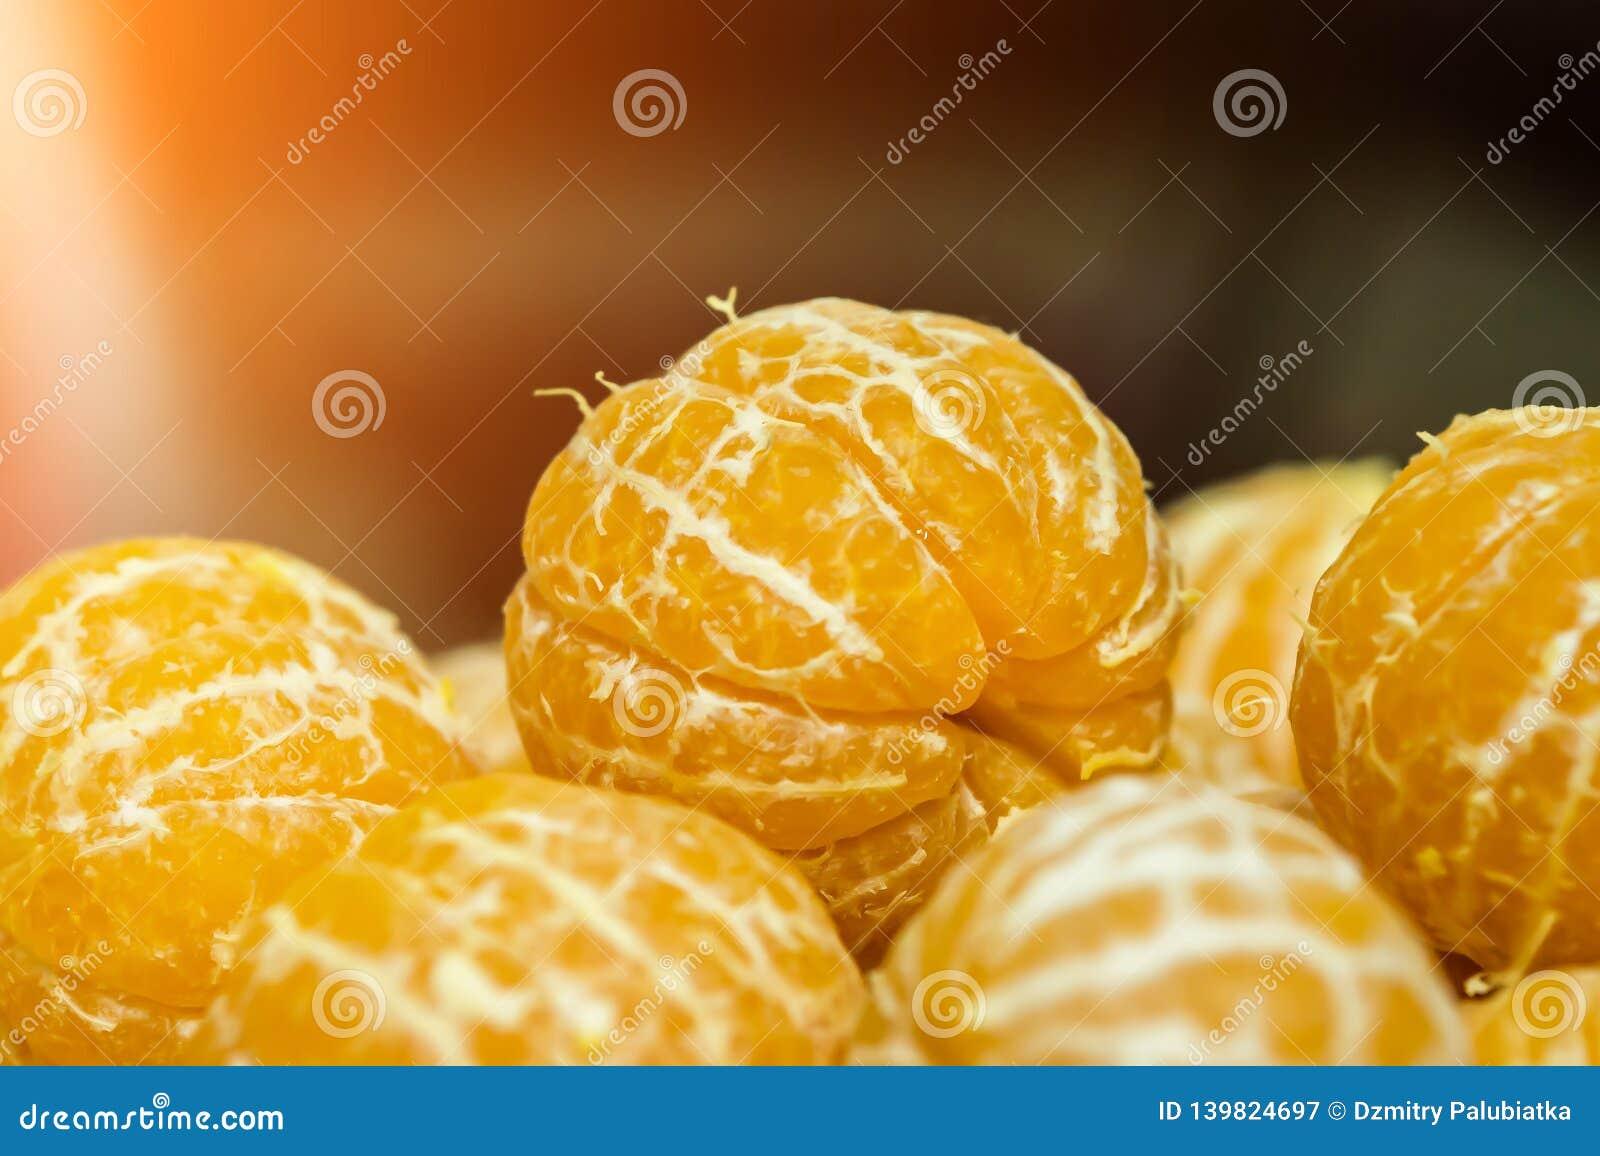 Mandarini senza buccia